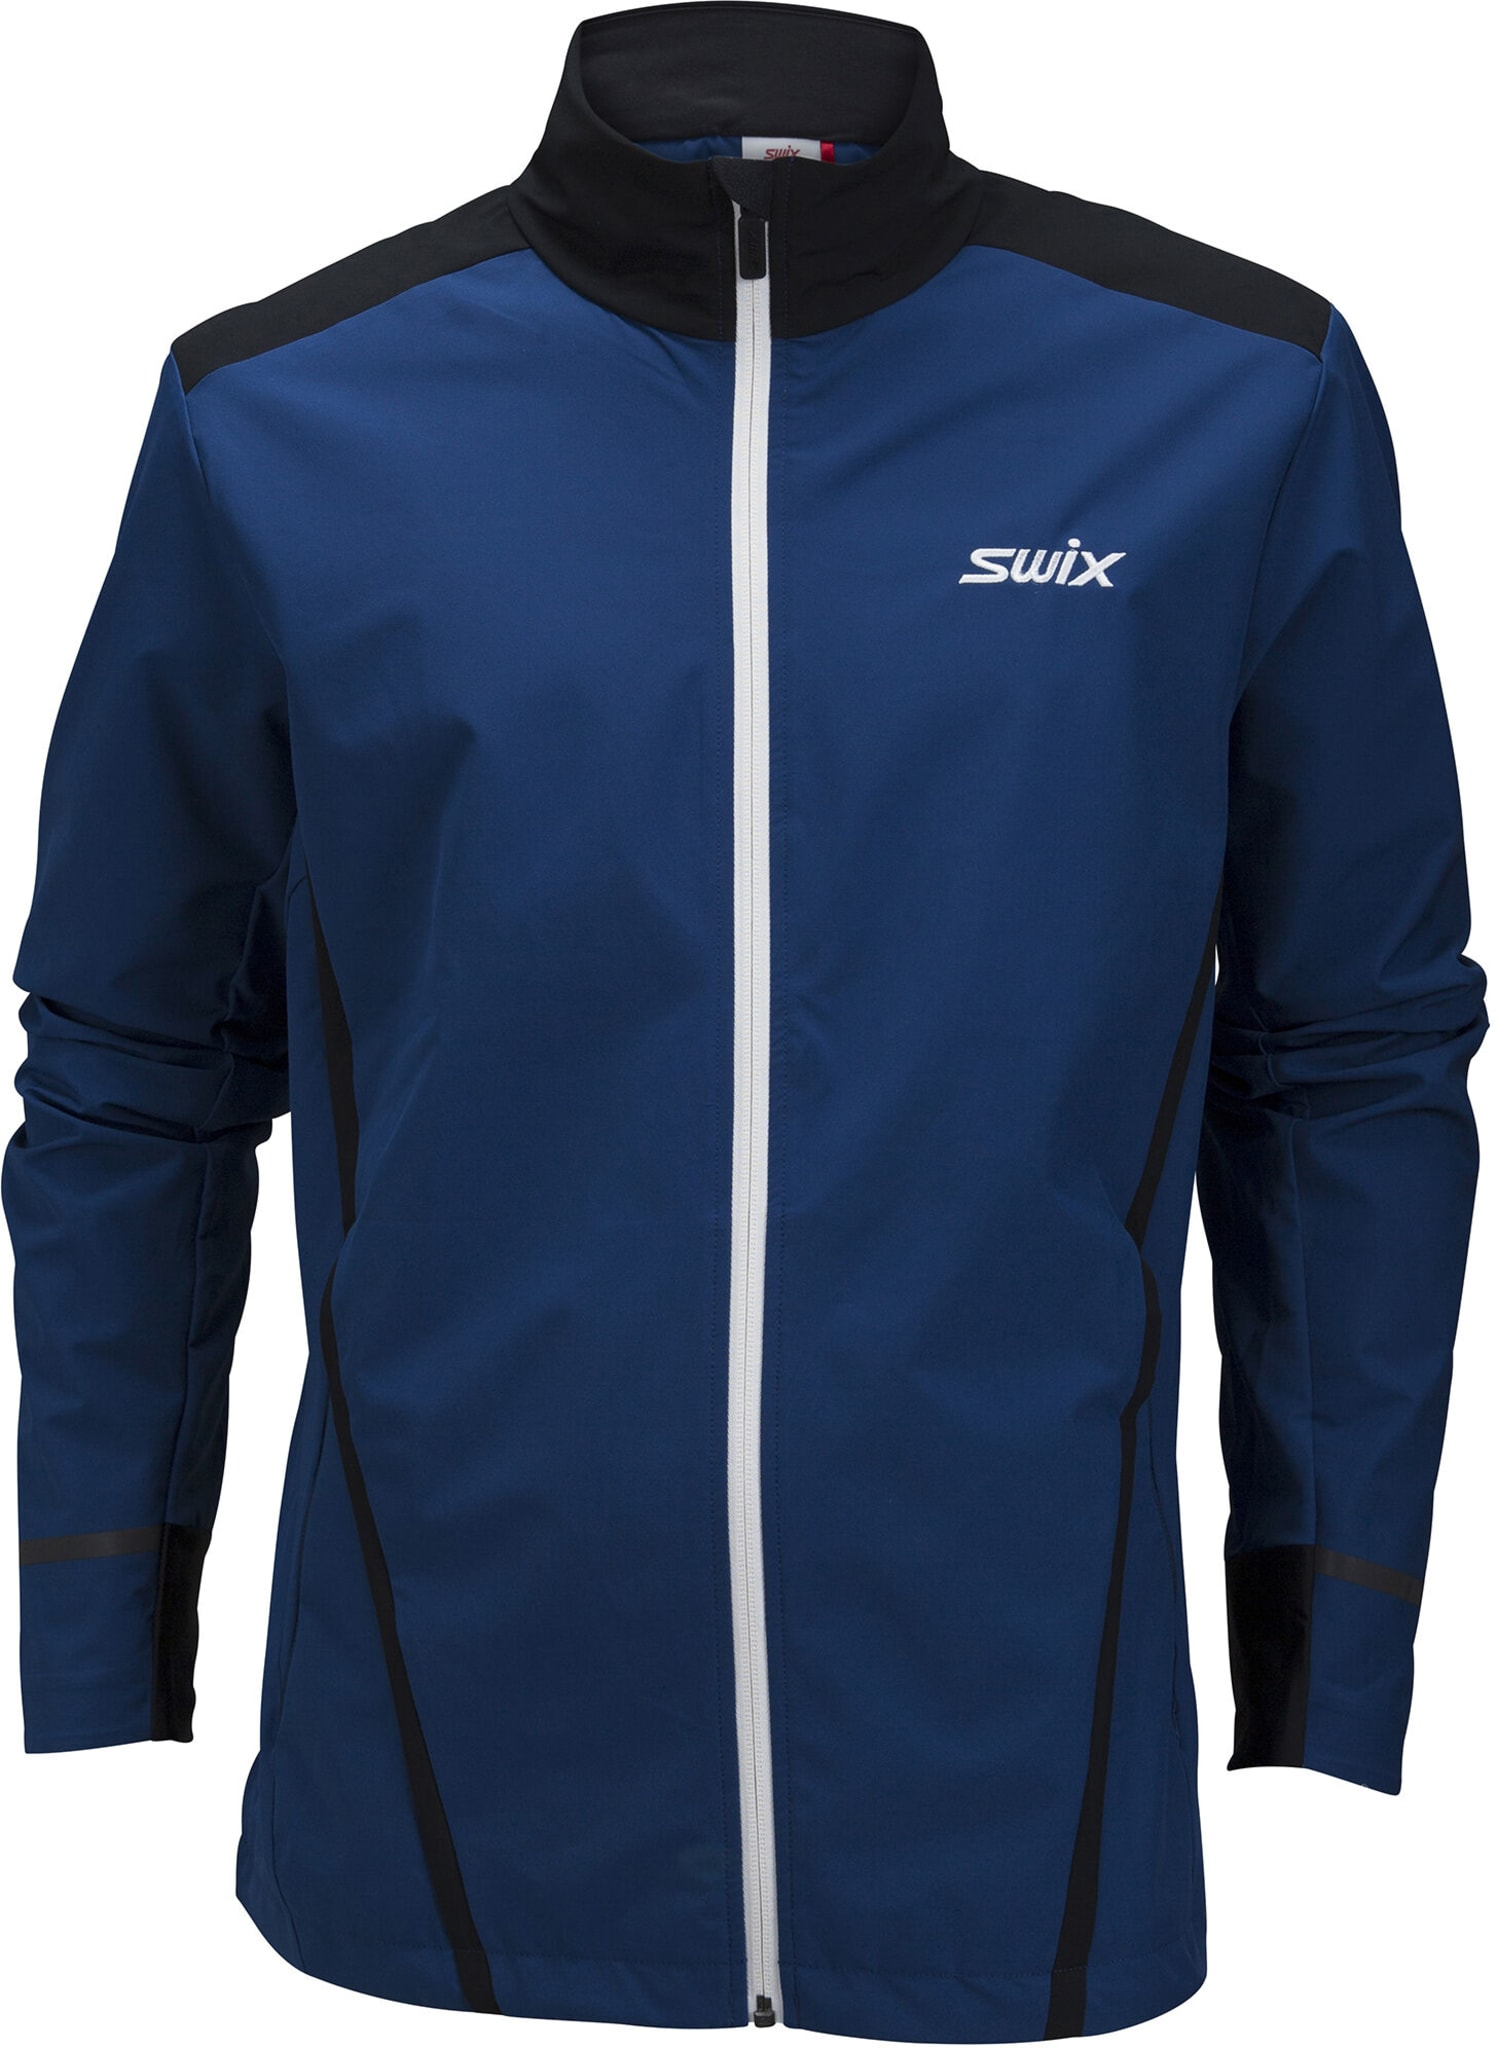 Star XC jacket M